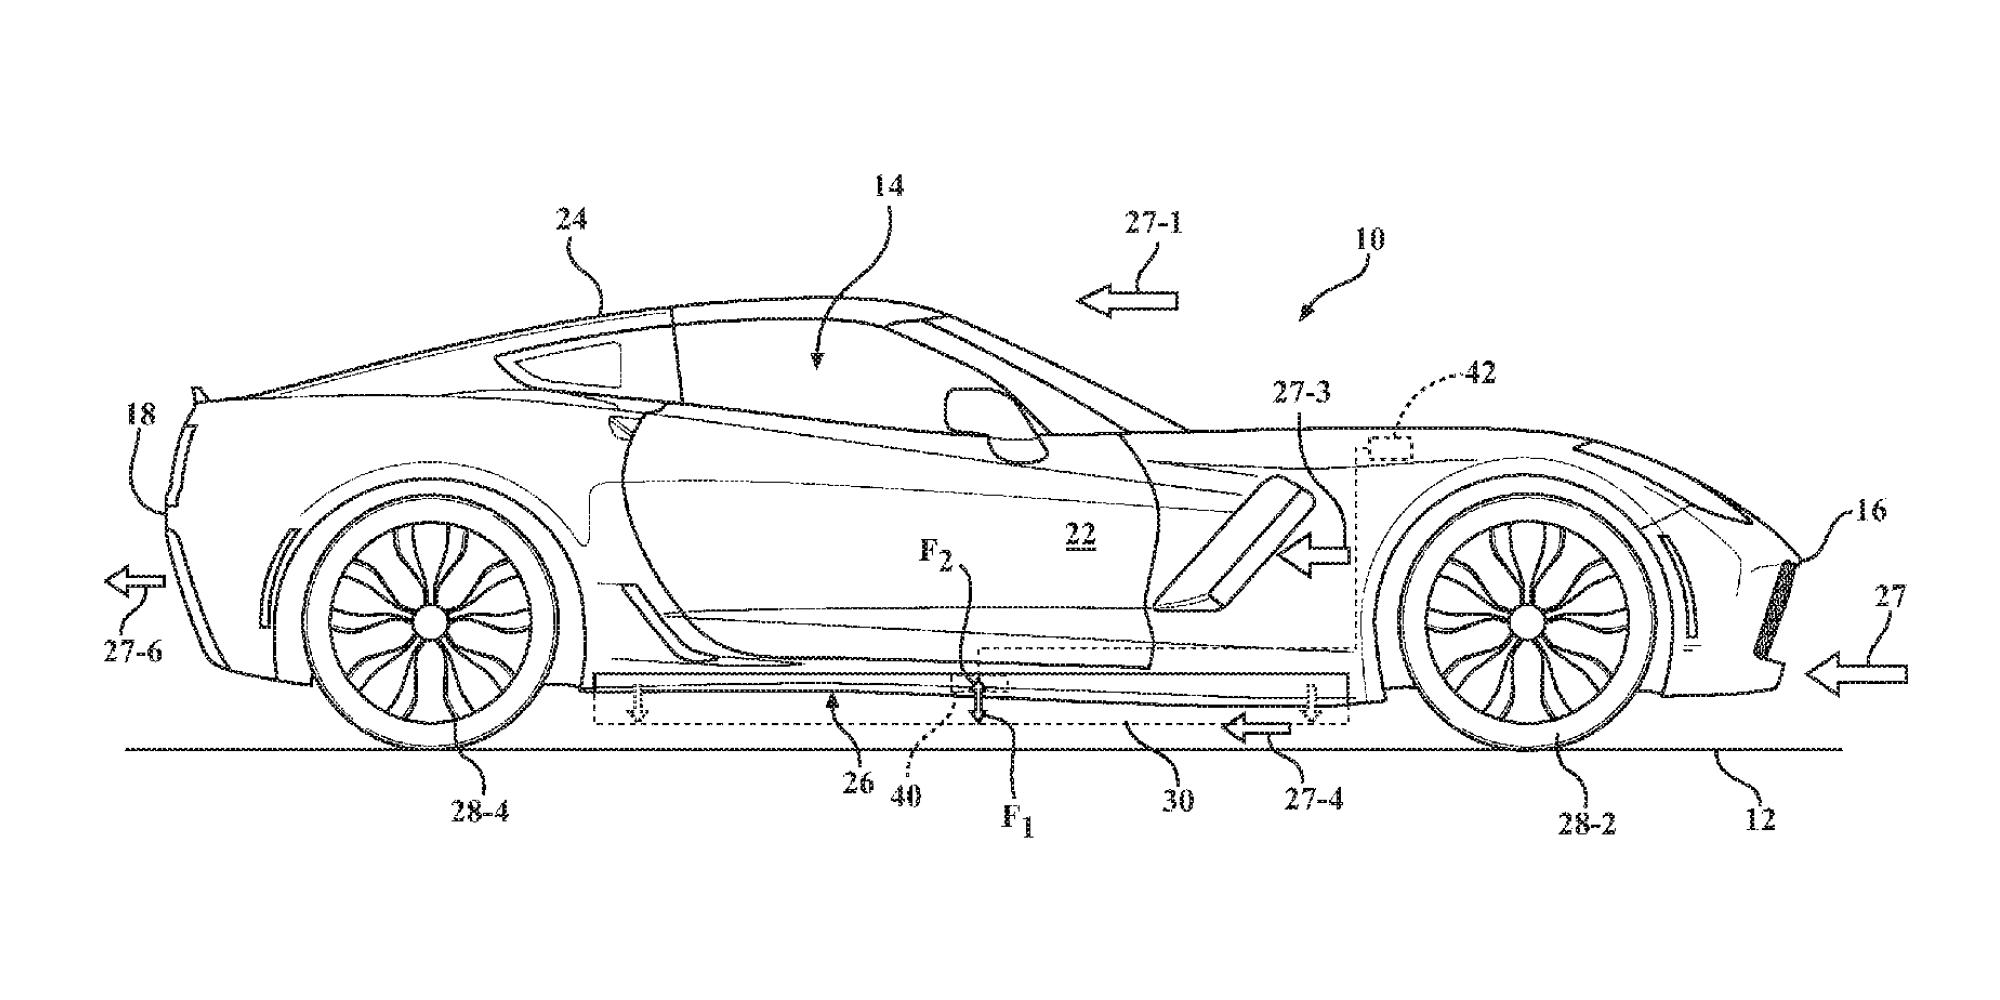 Corvette active aero patent 2018